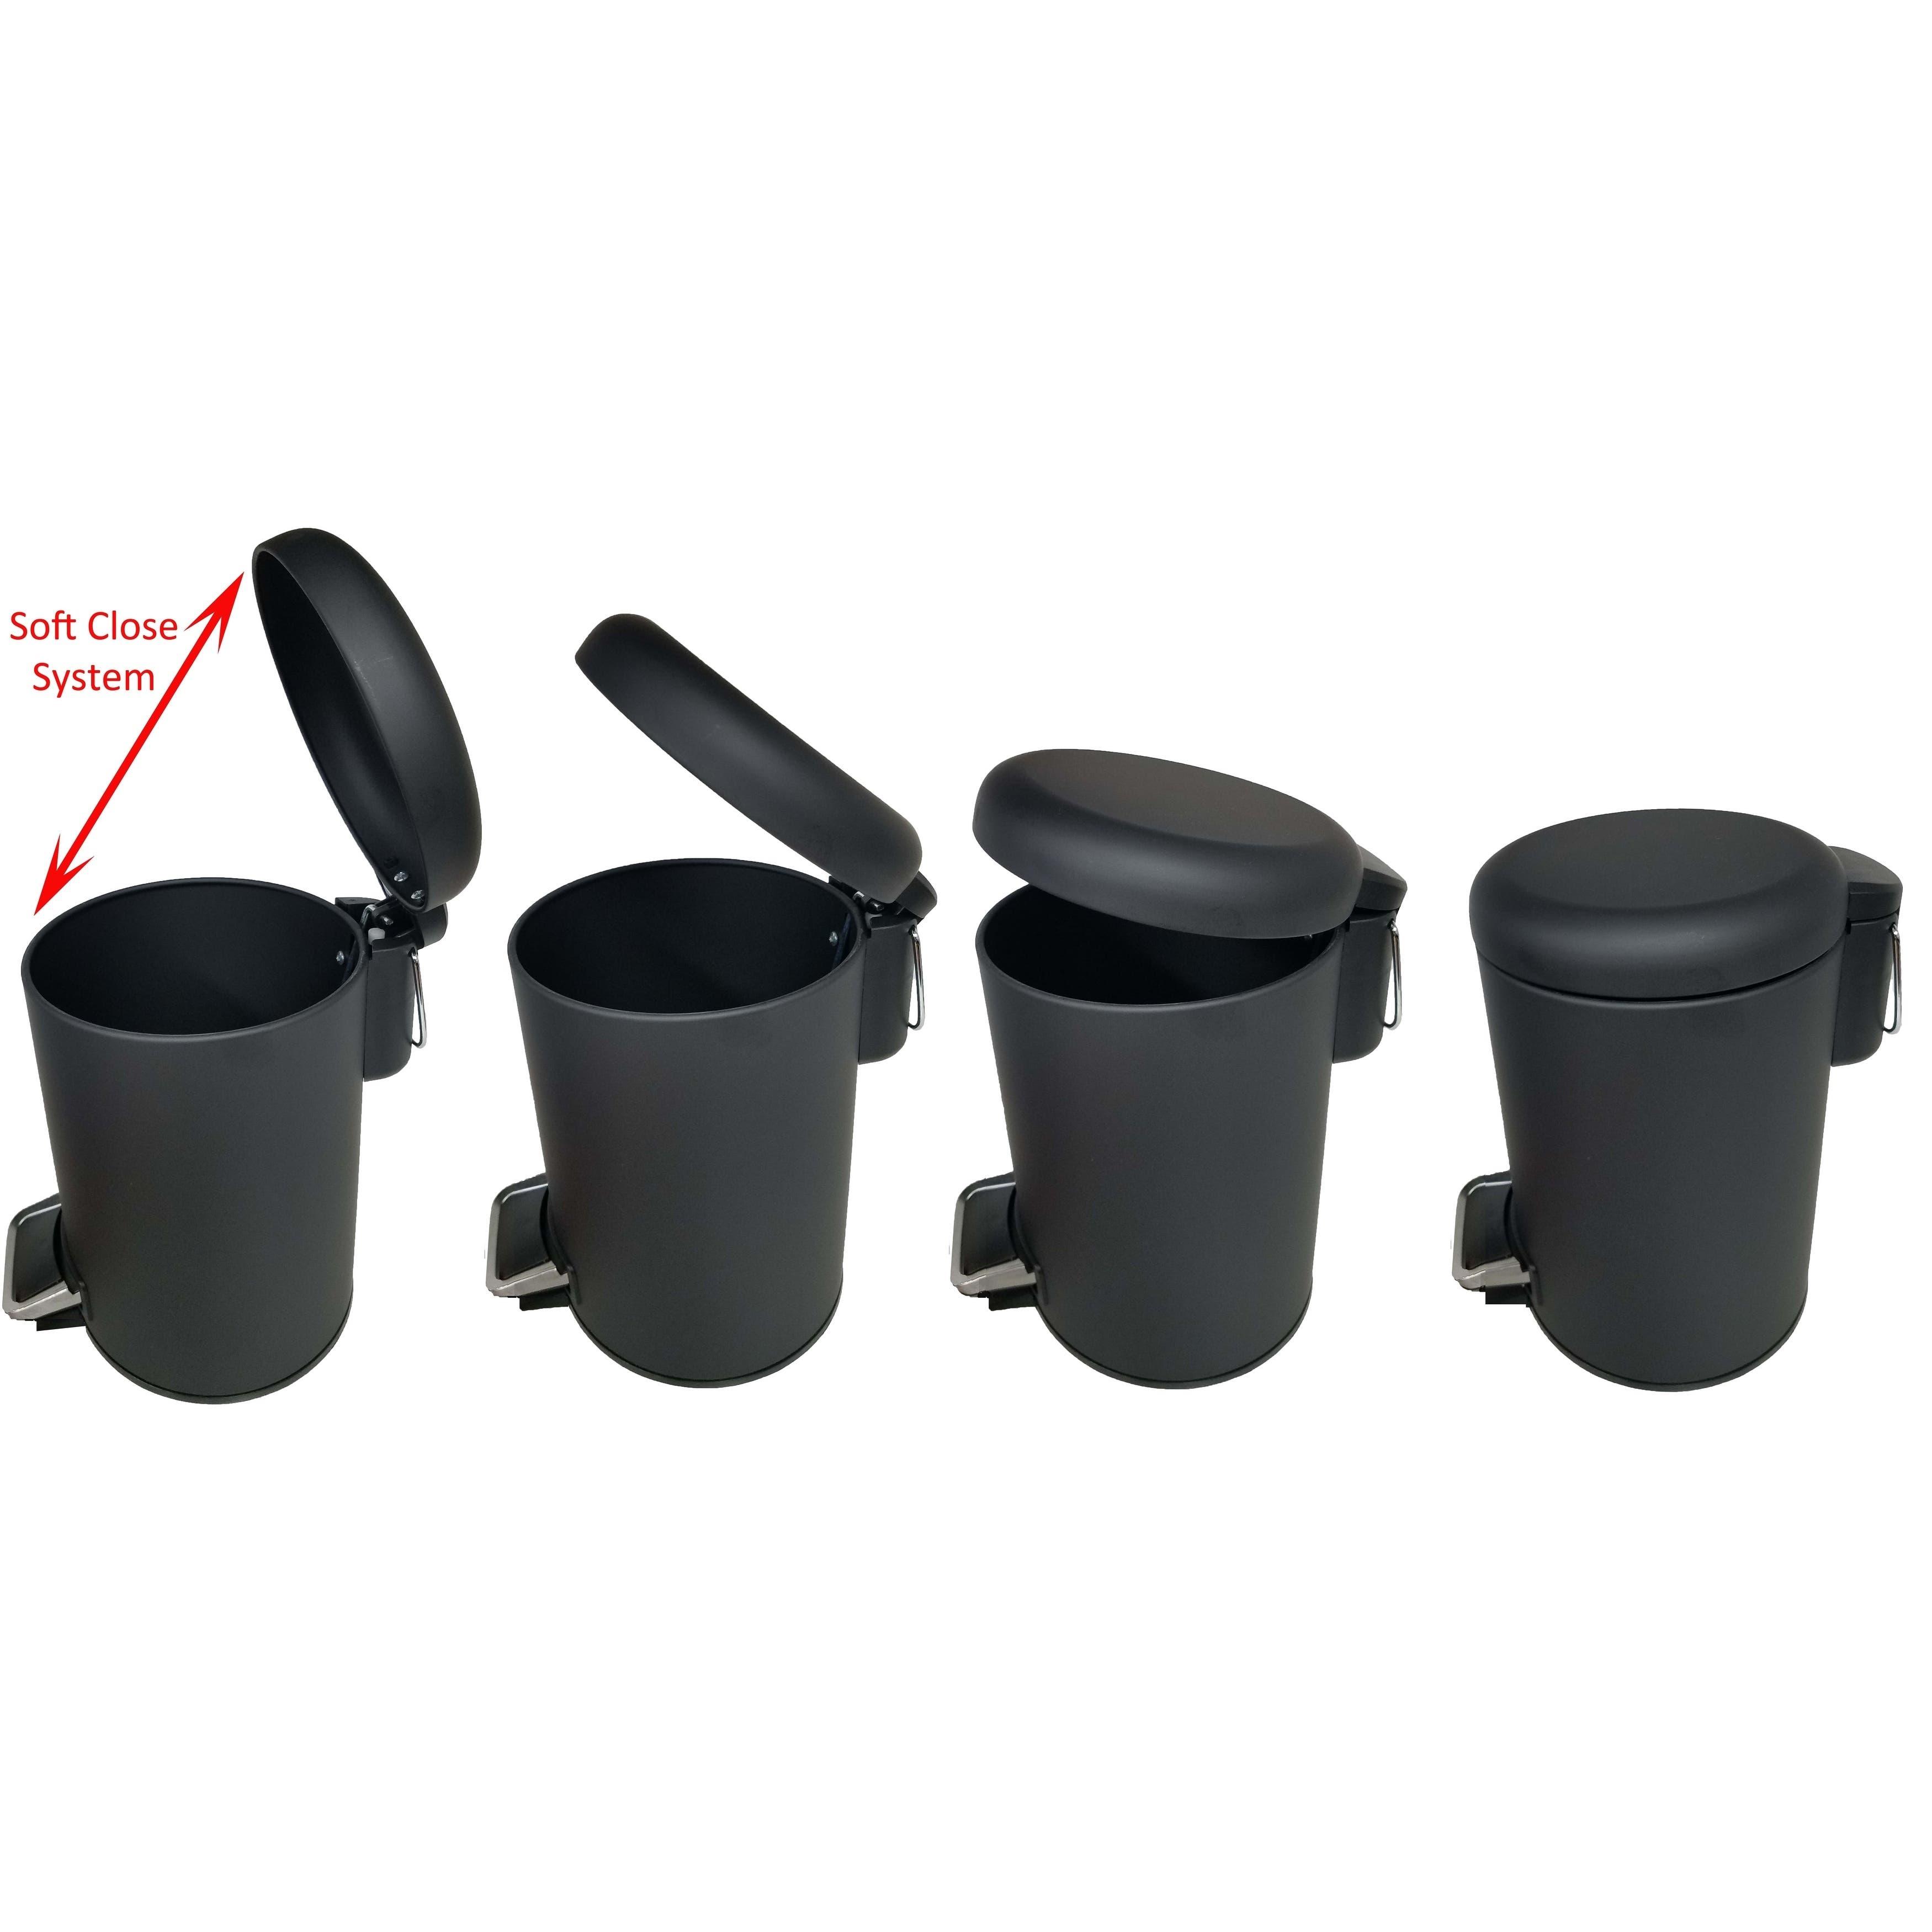 buy trash cans waste baskets online at our best bathroom accessories deals. Black Bedroom Furniture Sets. Home Design Ideas